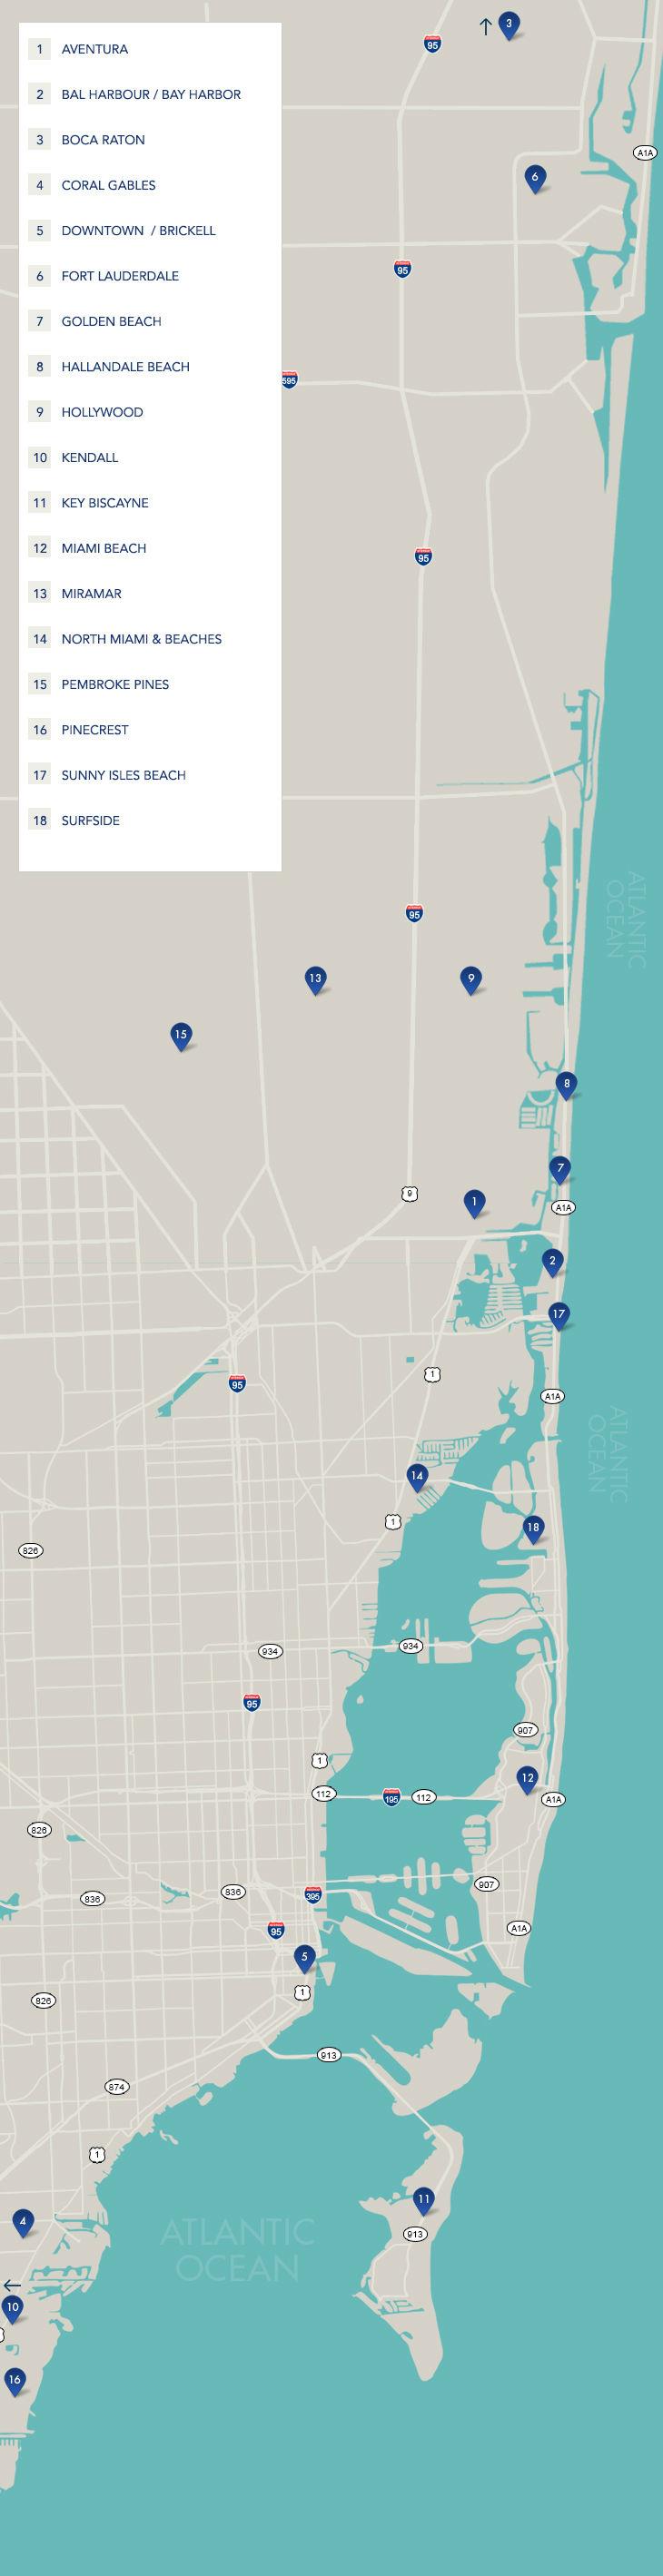 South Florida Neighborhoods | Map Of South Florida - Pembroke Pines Florida Map